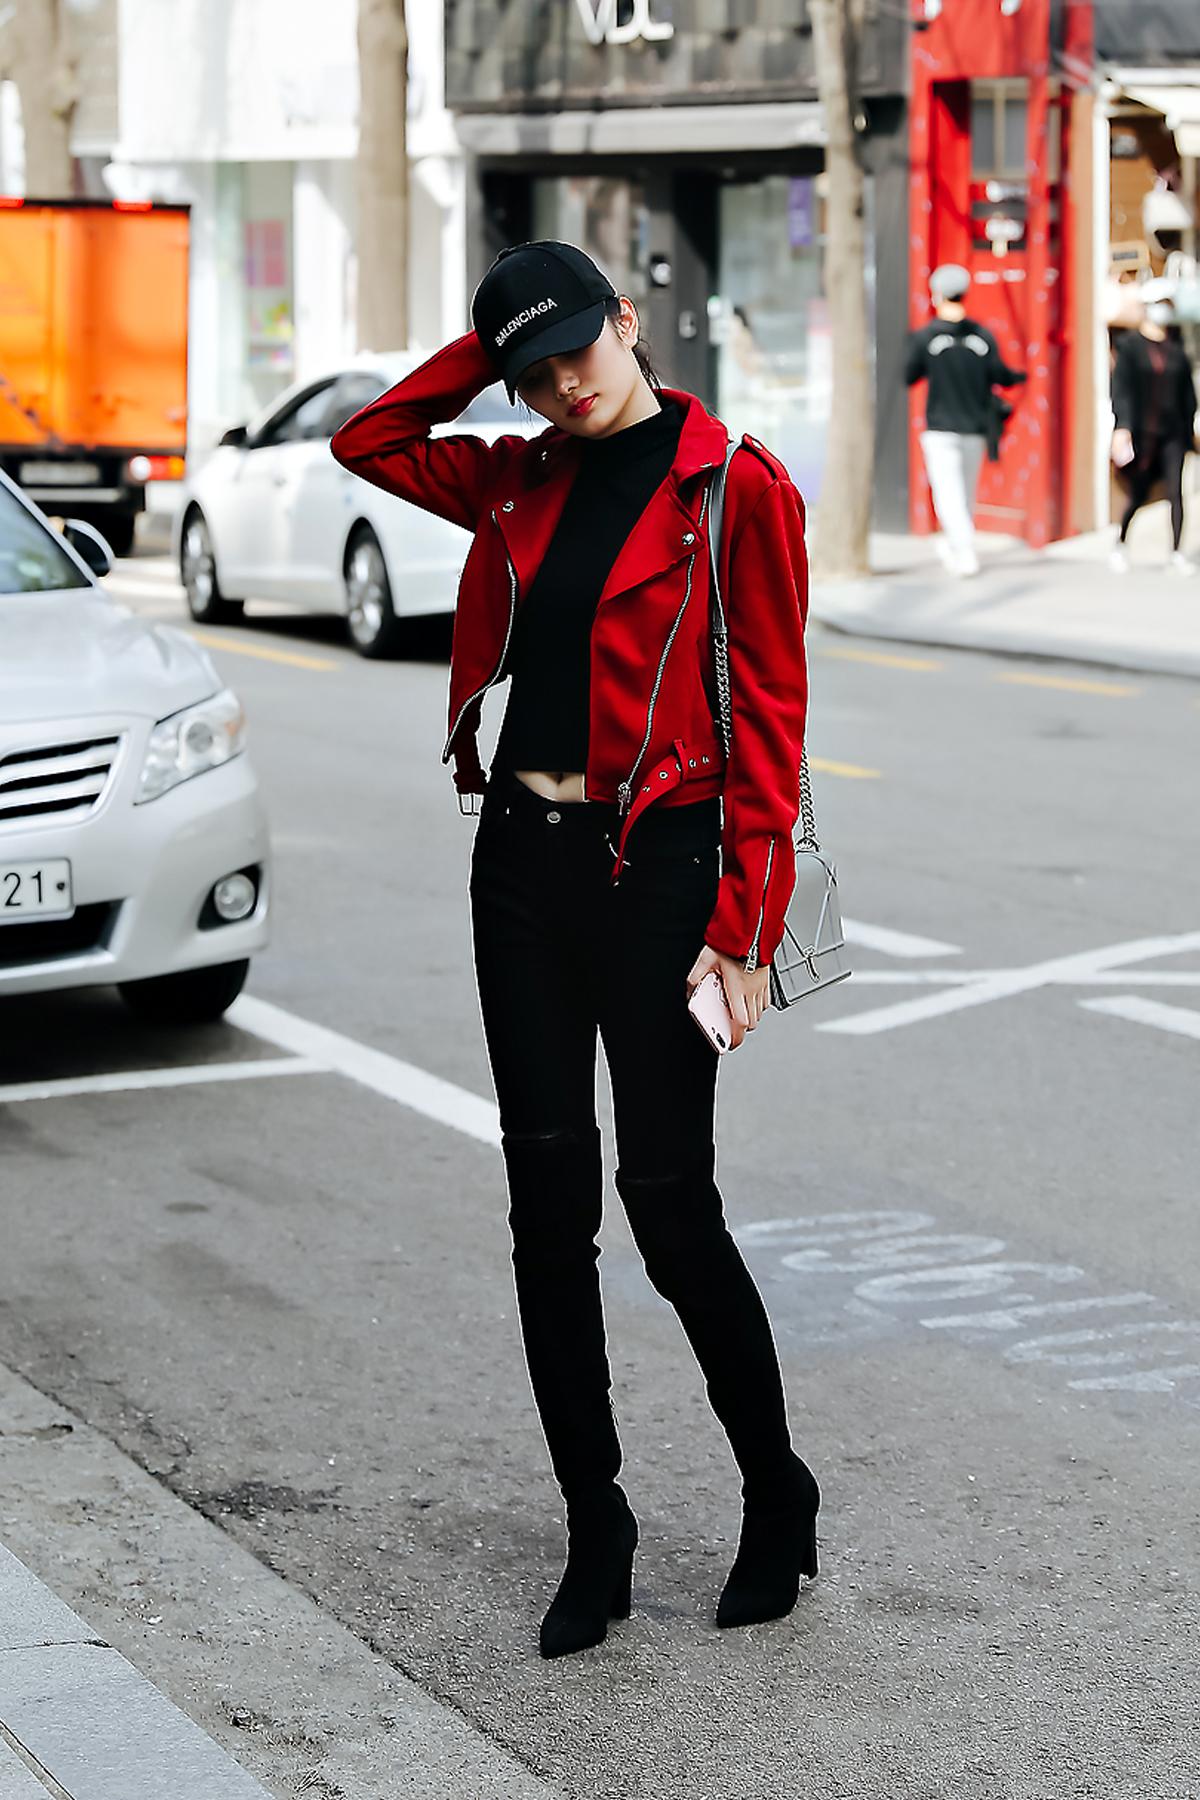 dieu linh, Street style women spring 2018 in seoul